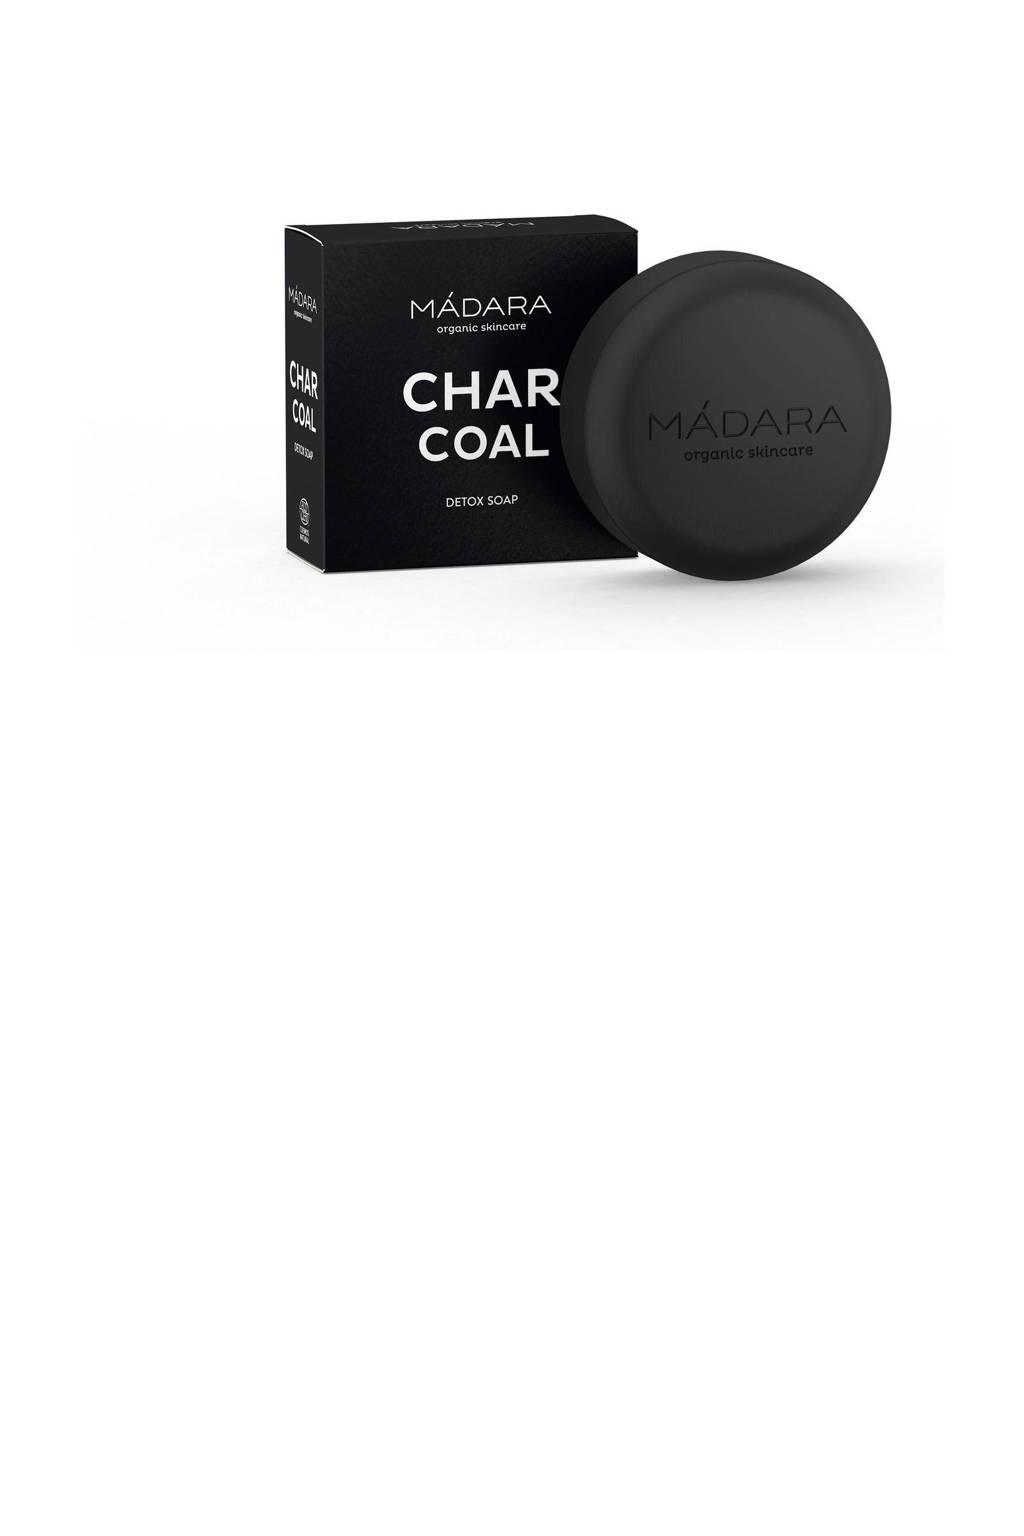 Mádara Charcoal Detox body soap